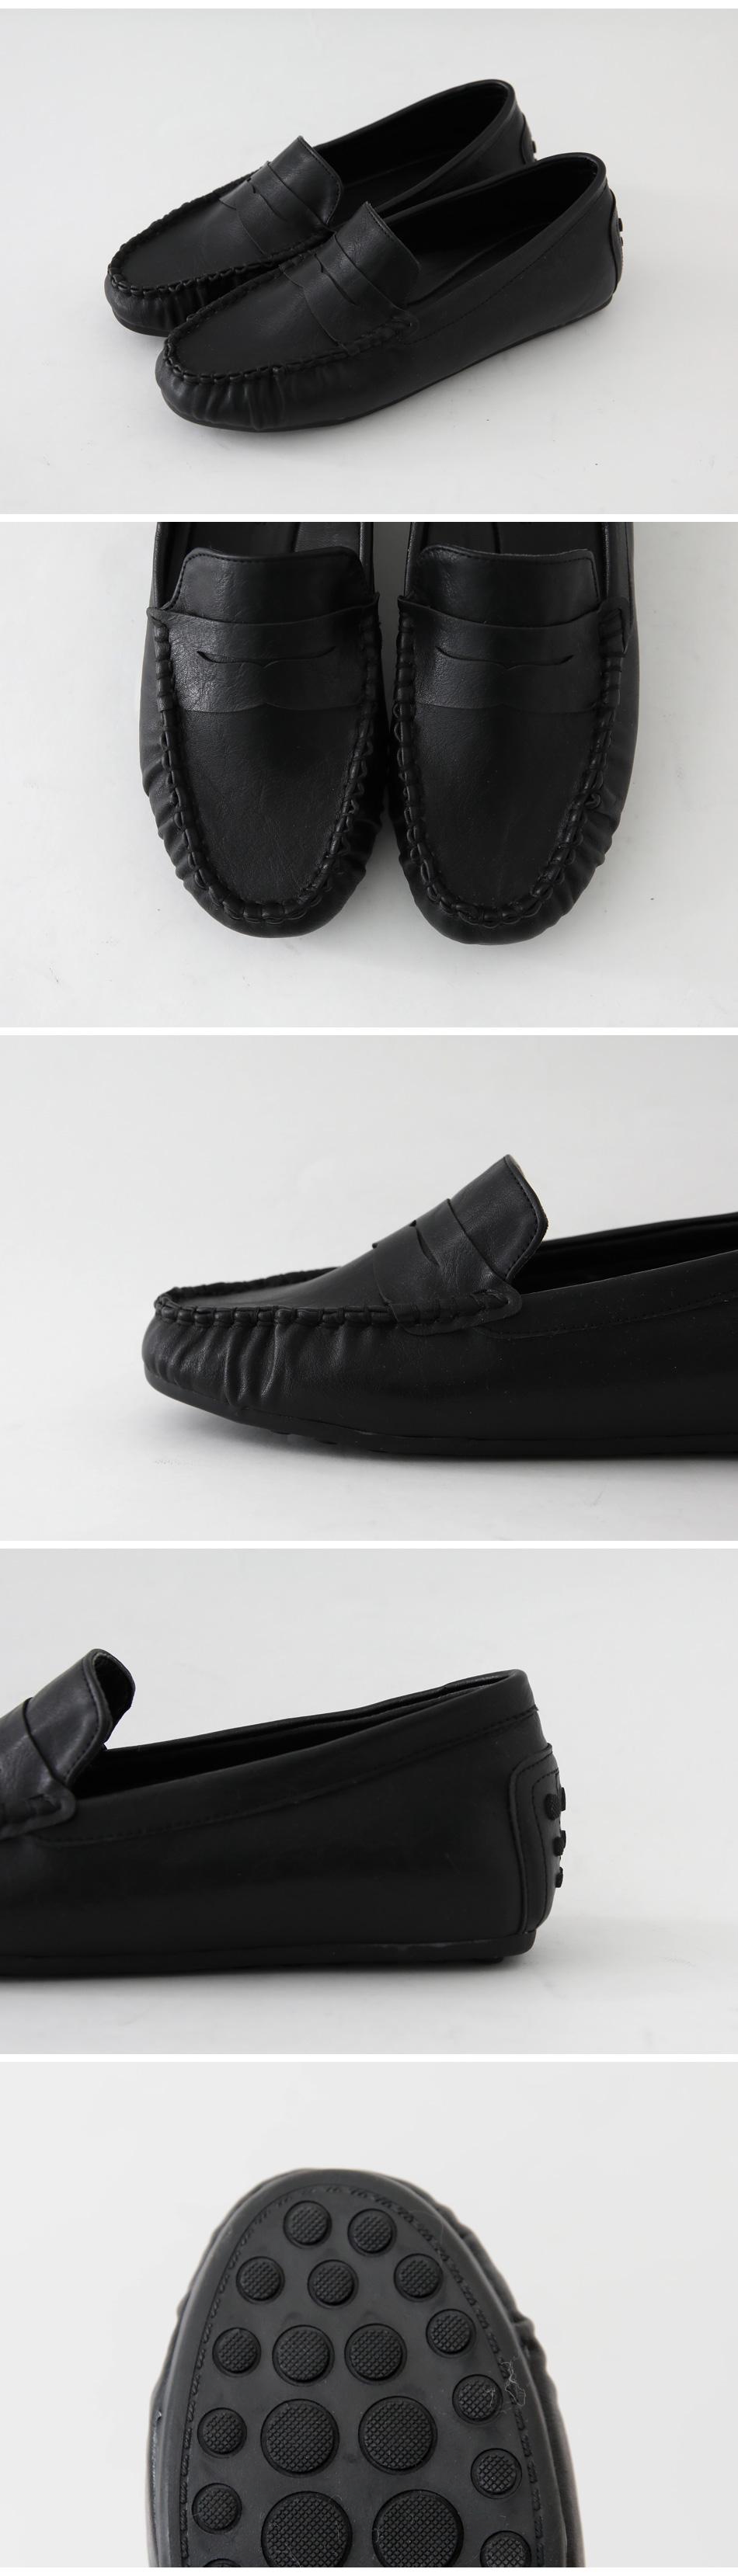 Kobelon Height Loafers 3cm